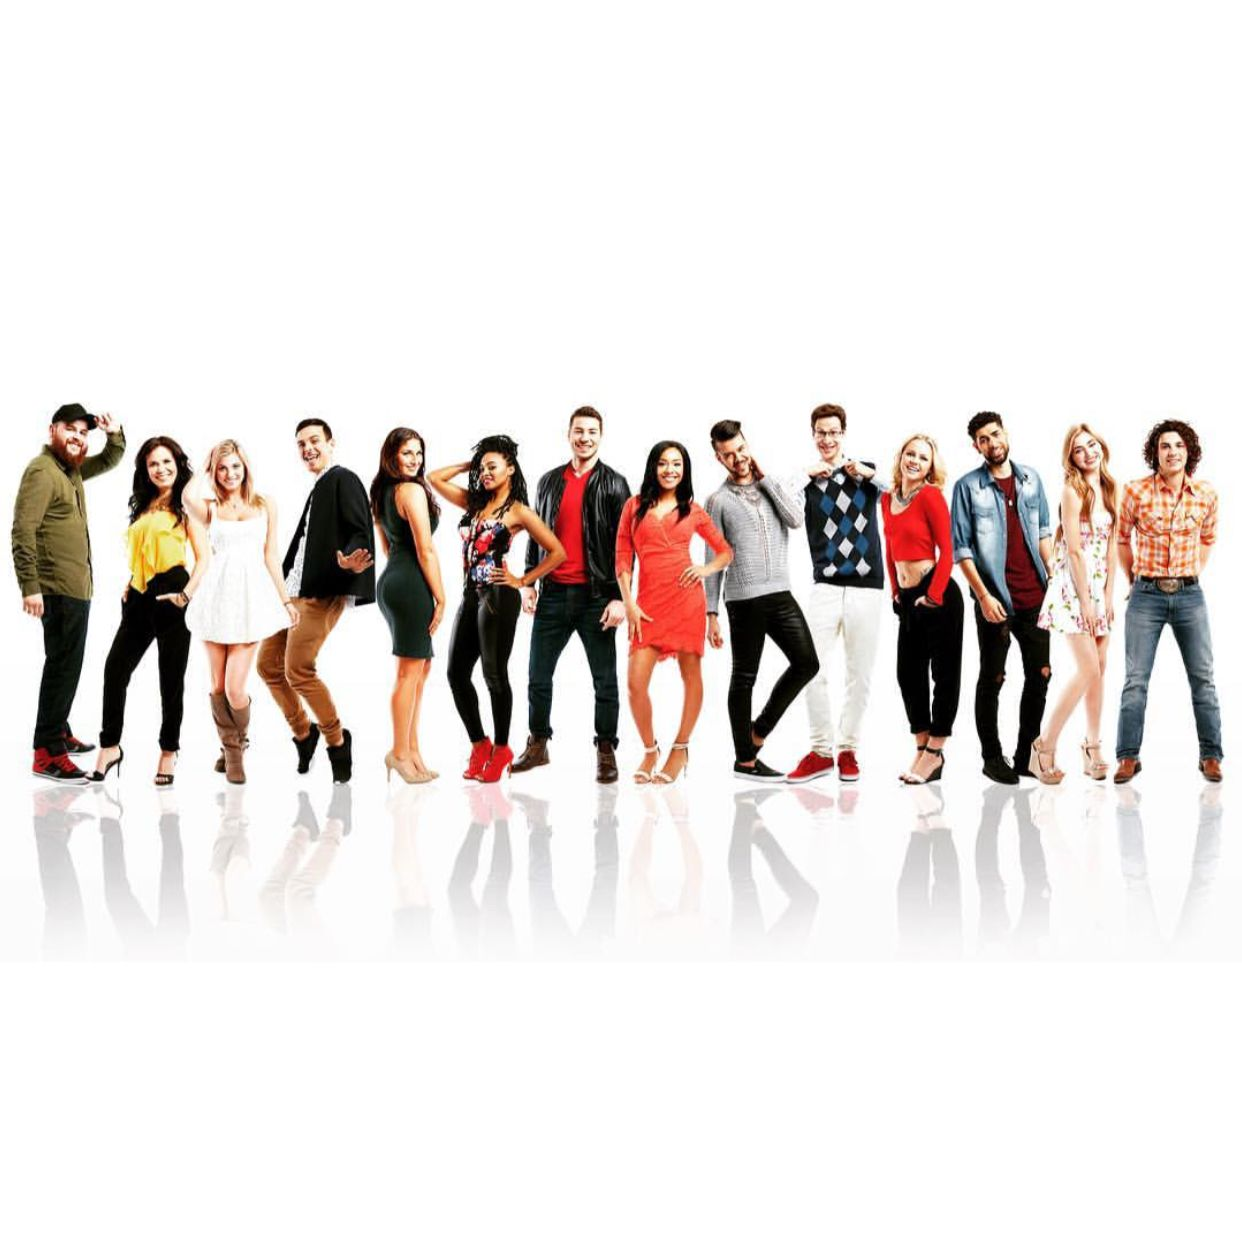 Big Brother Canada Season 4 Cast Big brother canada, Big